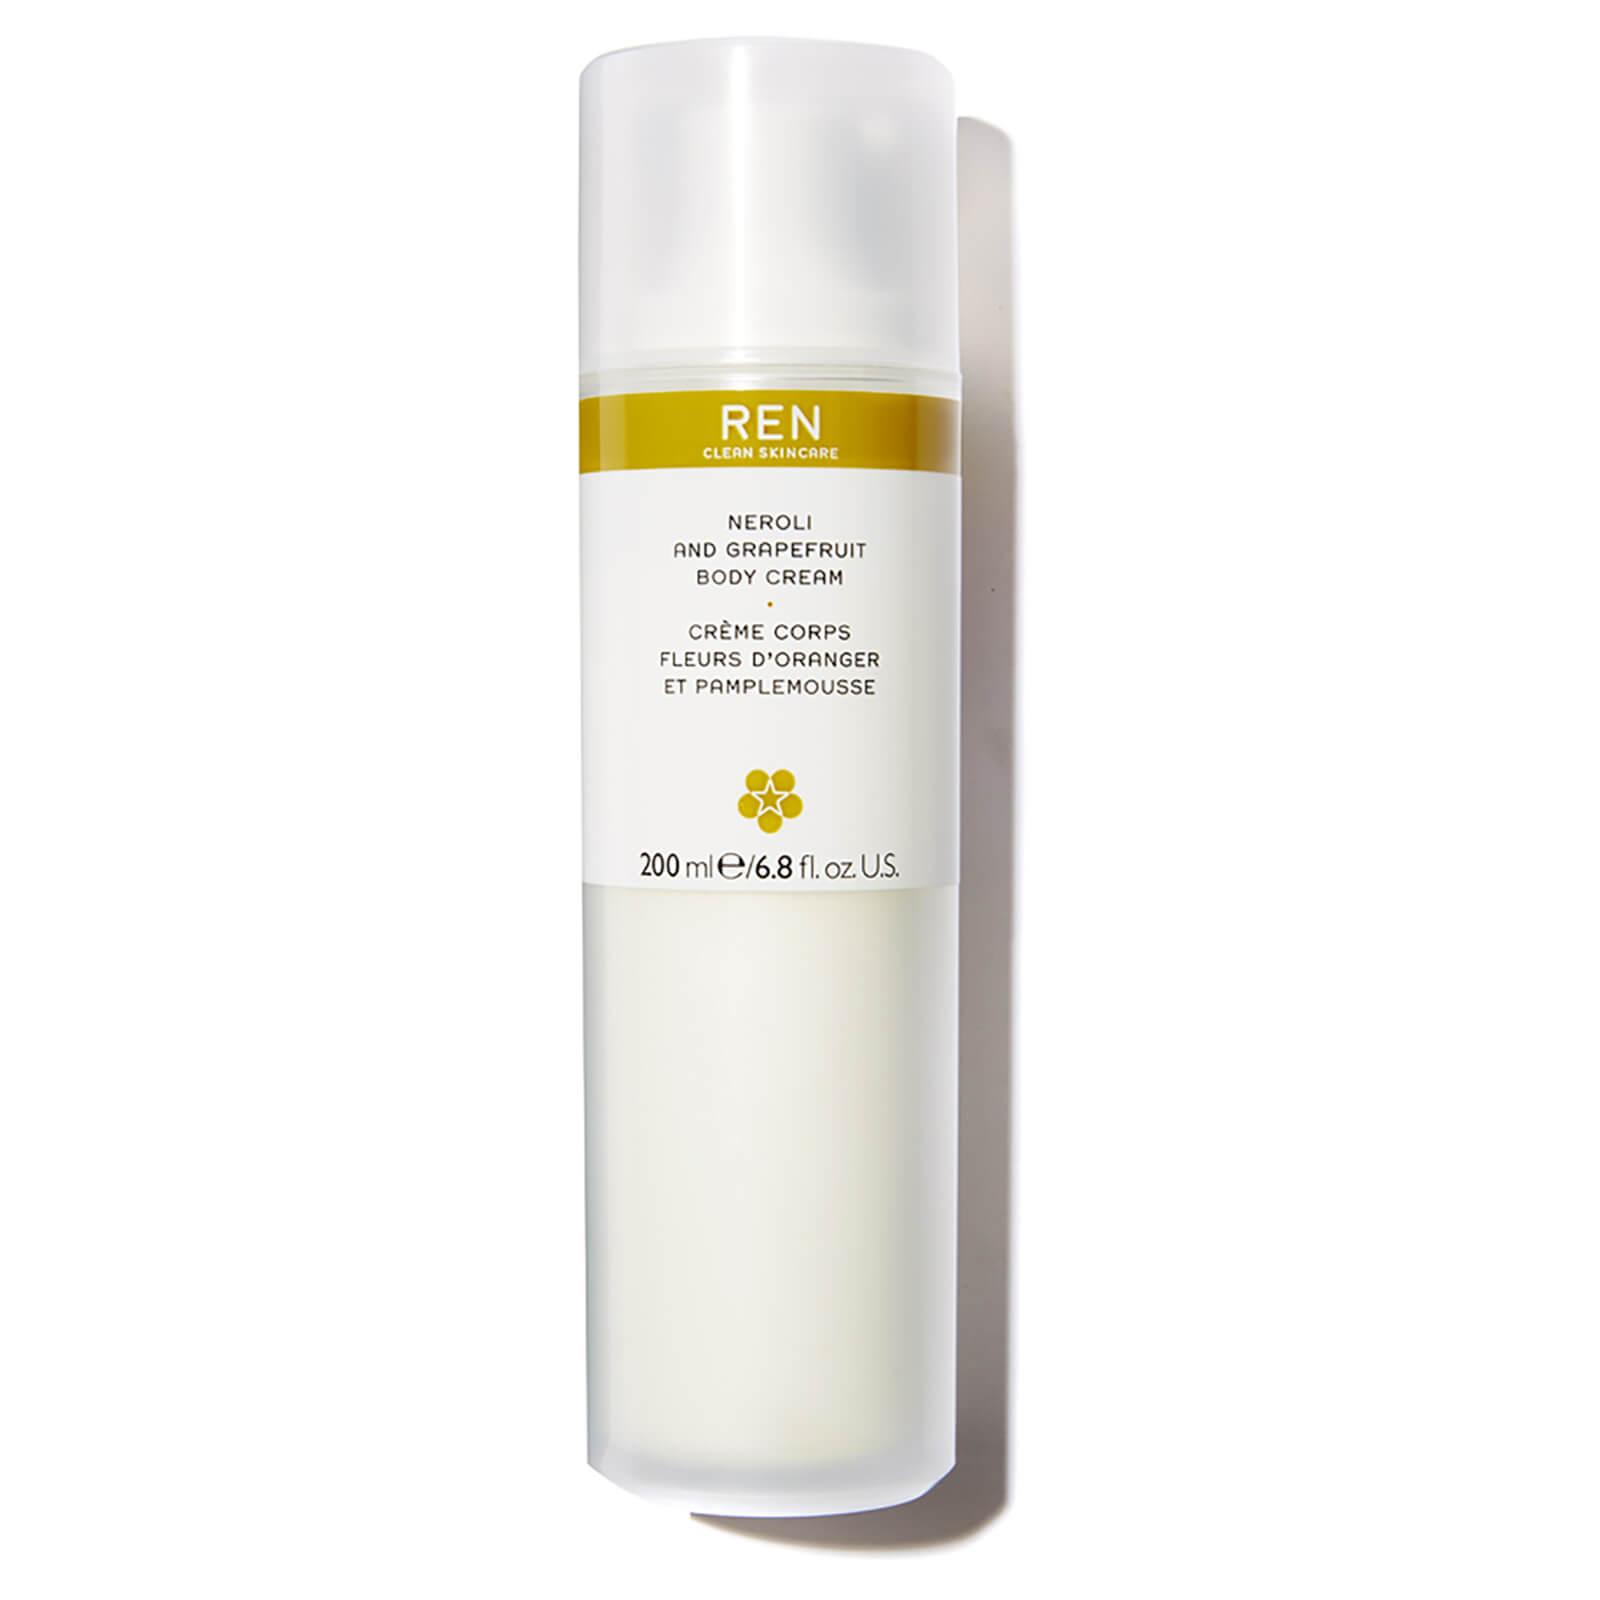 REN Clean Skincare Neroli and Grapfruit Body Cream 200ml